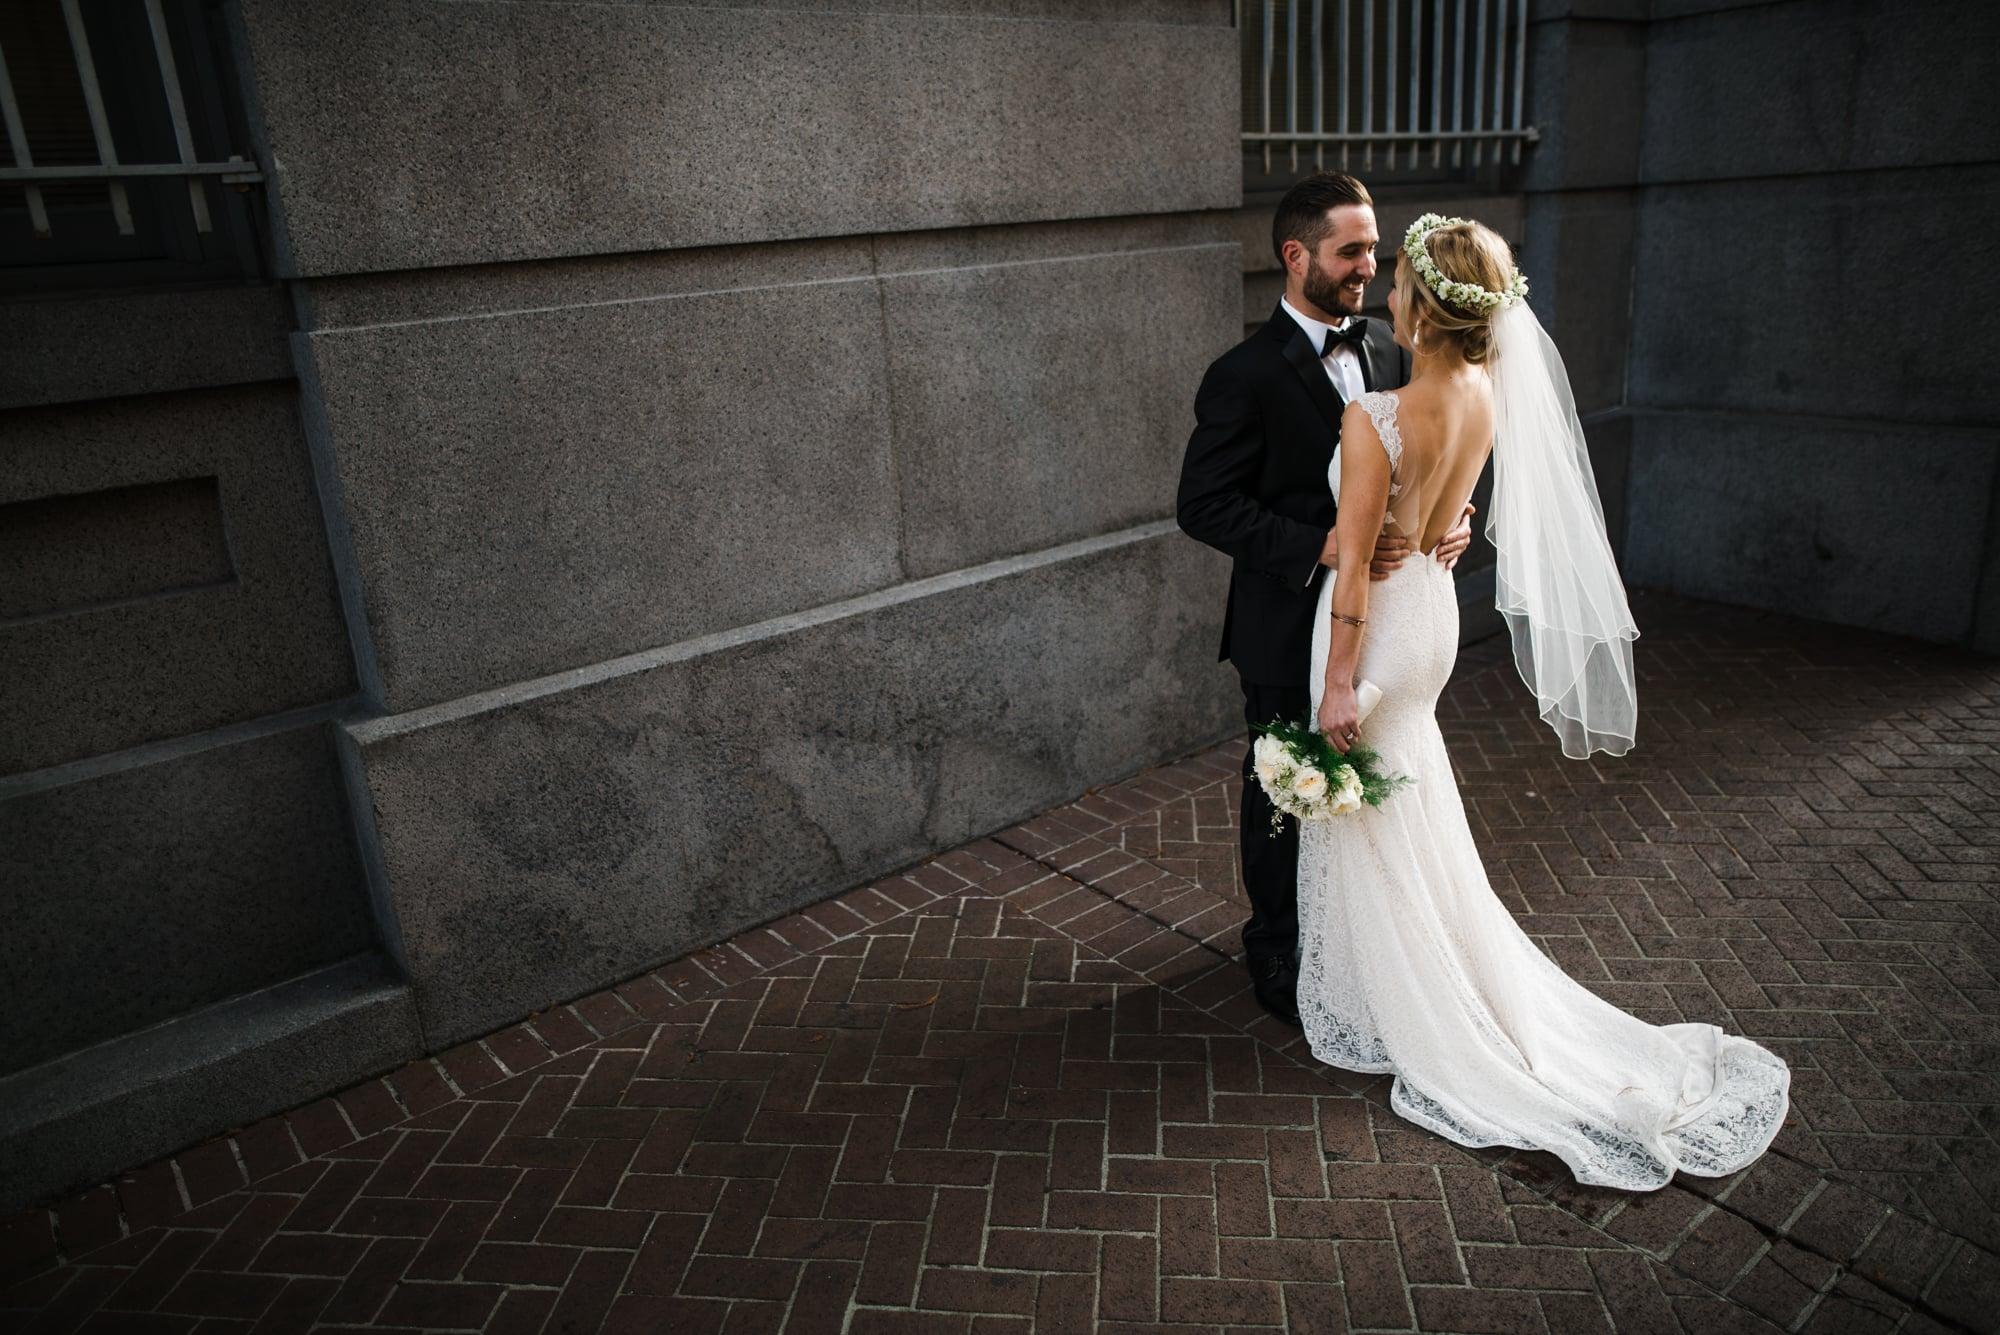 ©Isaiah & Taylor Photography - The Elms Mansion Wedding - New Orleans, Louisiana-27.jpg